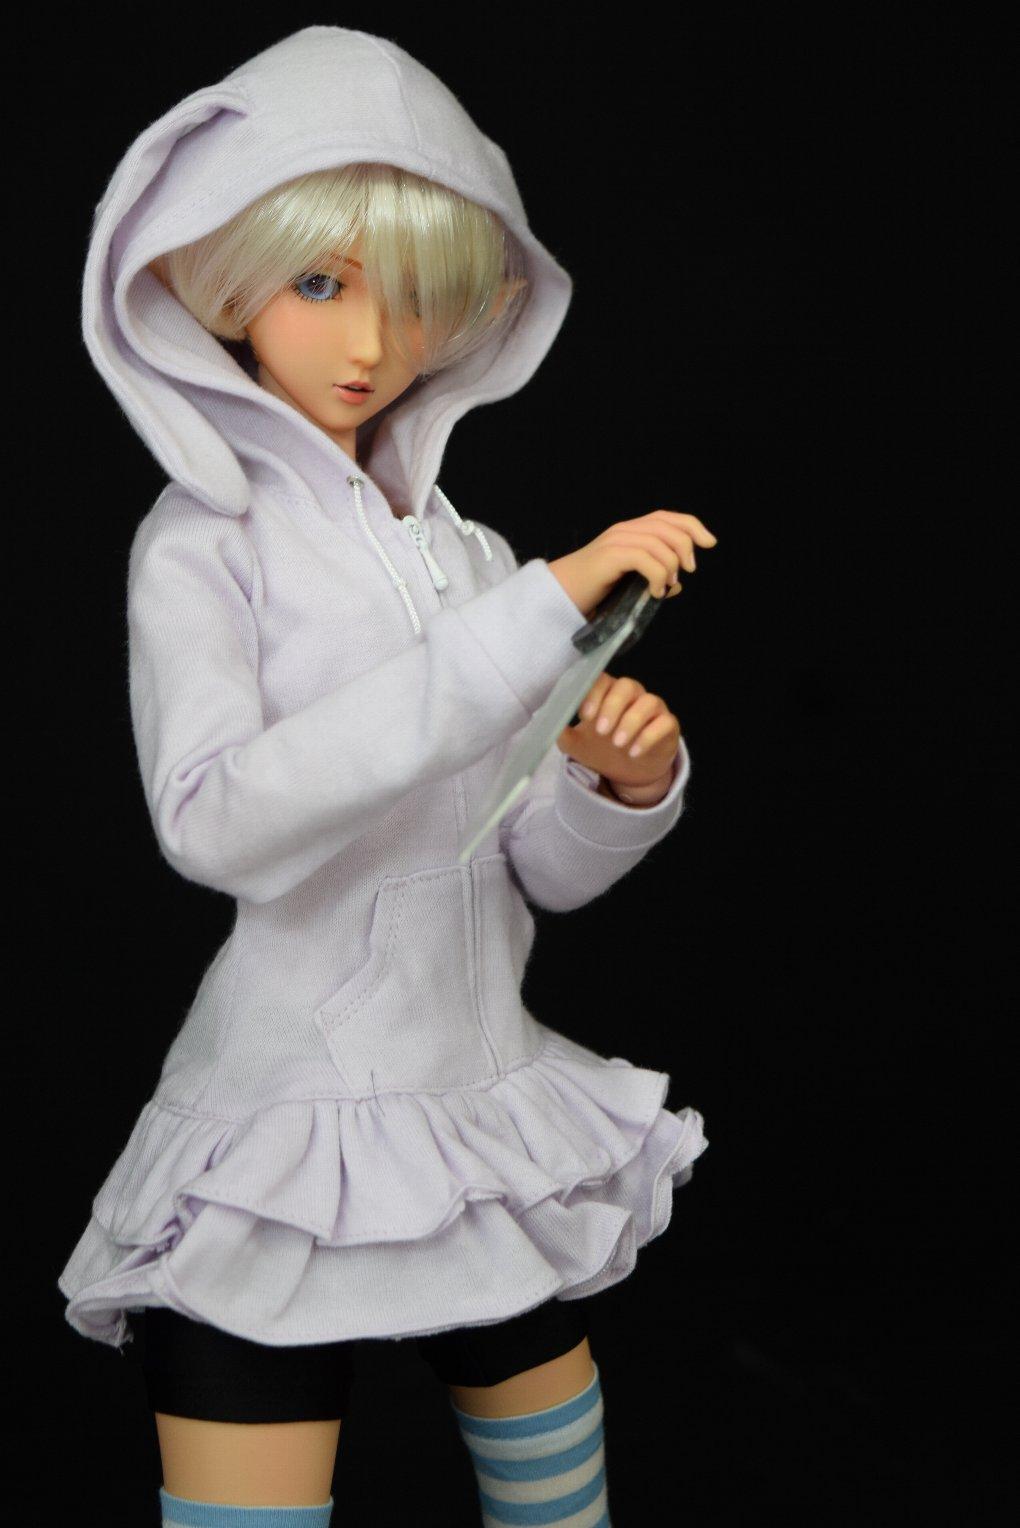 doll_4074.jpg